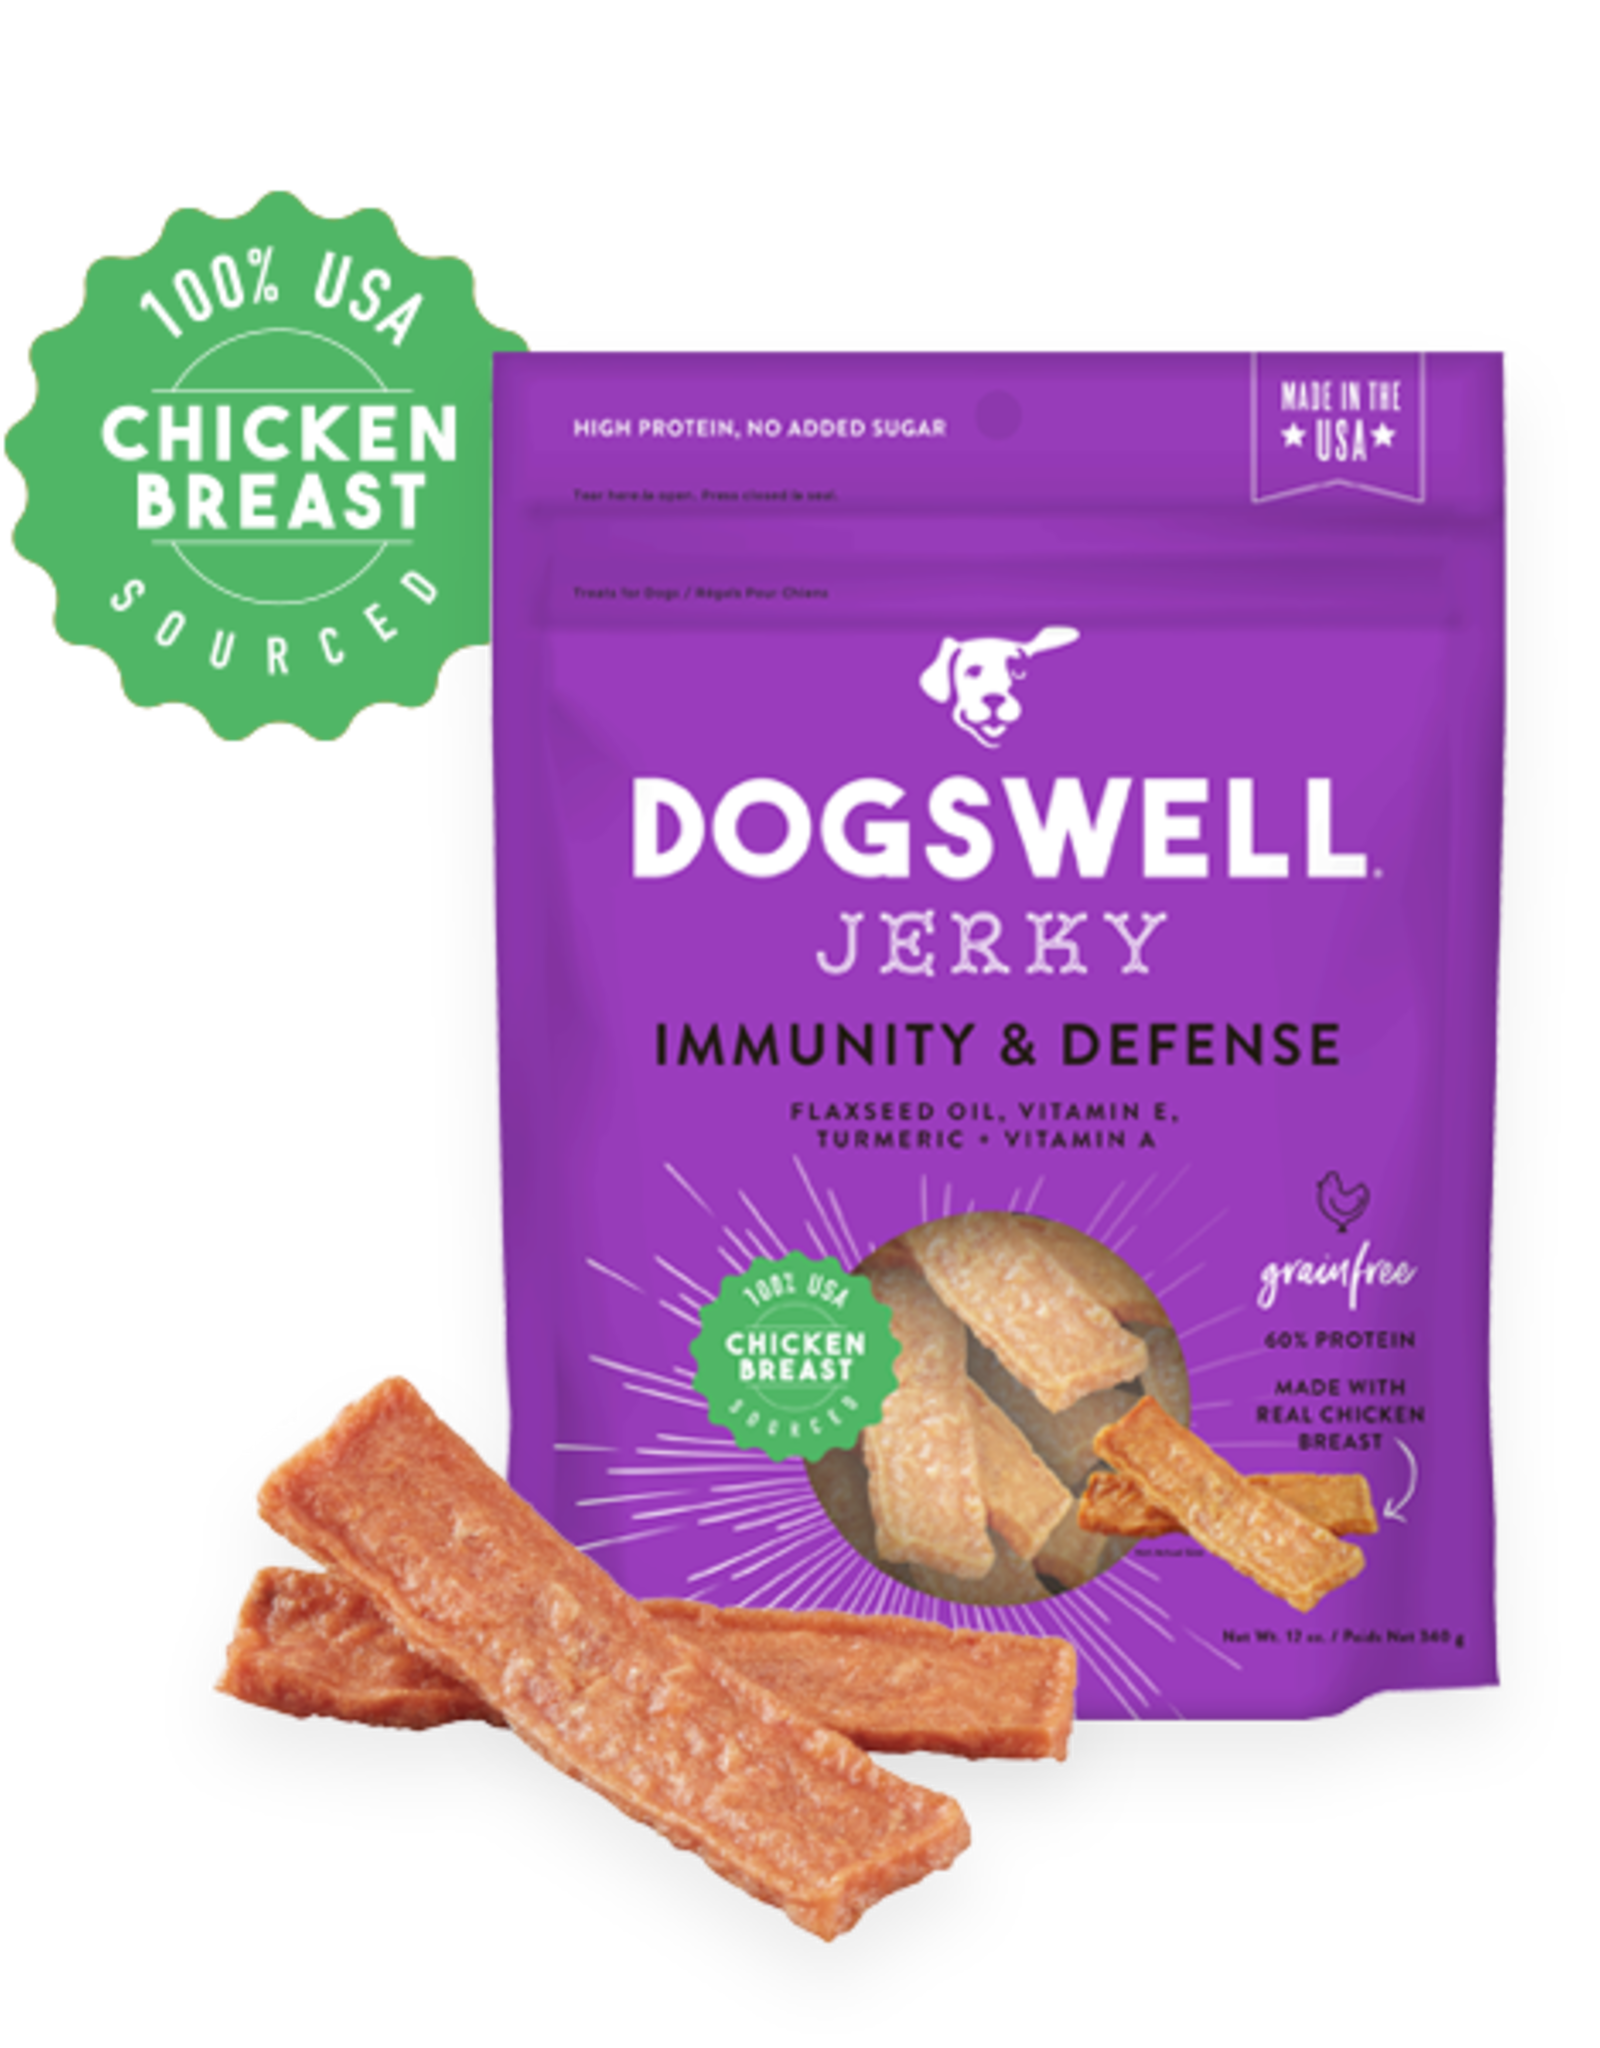 DOGSWELL, LLC DOGSWELL DOG IMMUNE DEFENSE JERKY GRAIN FREE CHICKEN 12OZ